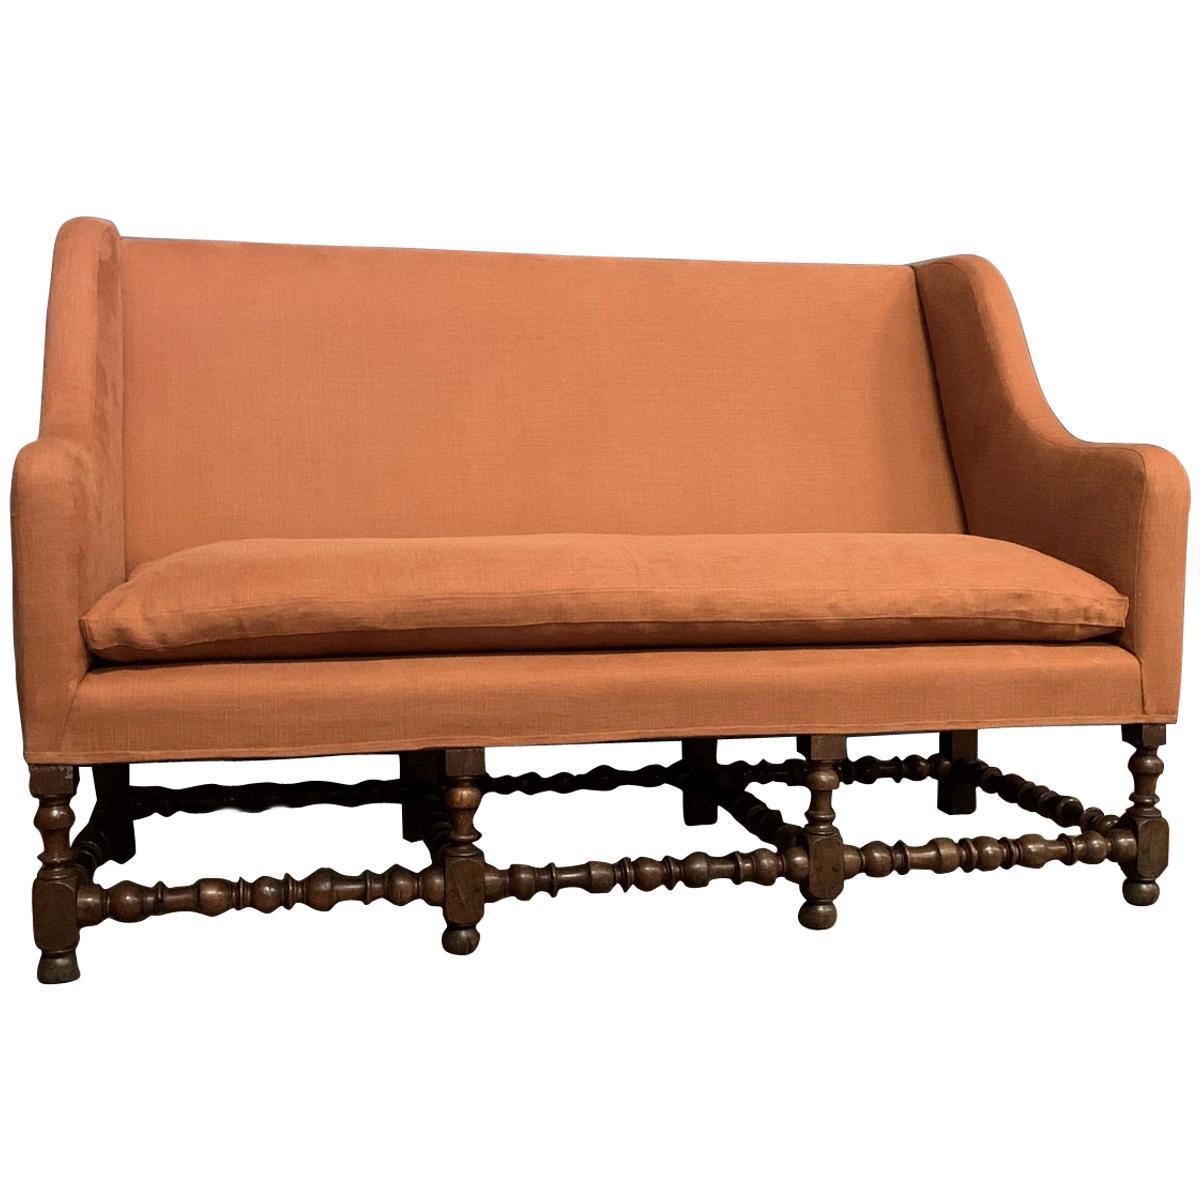 17th Century Walnut Sofa